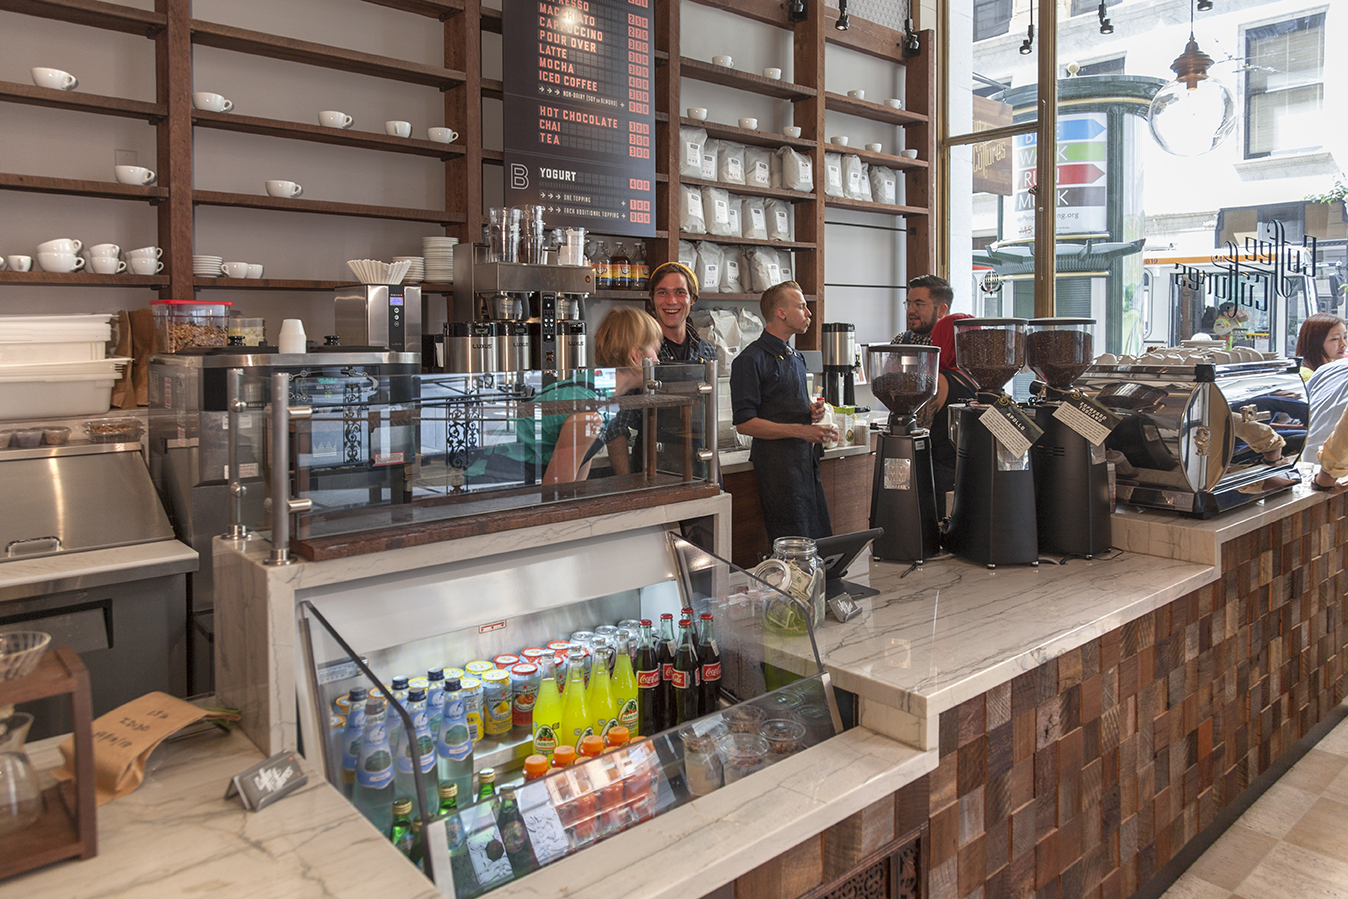 coffeeculture_3412_LR.jpg